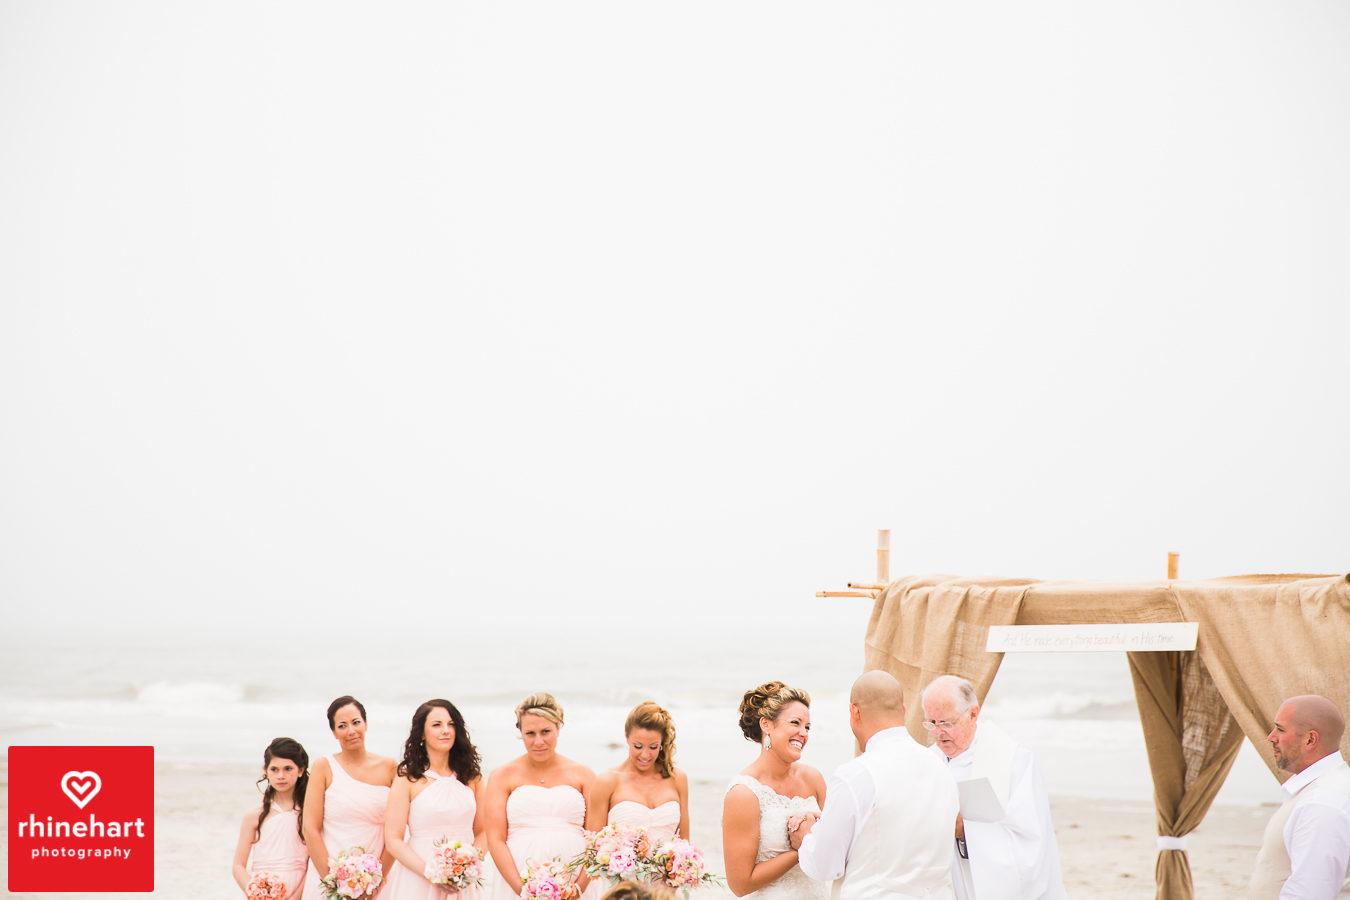 reeds-stone-harbor-wedding-photographer-119